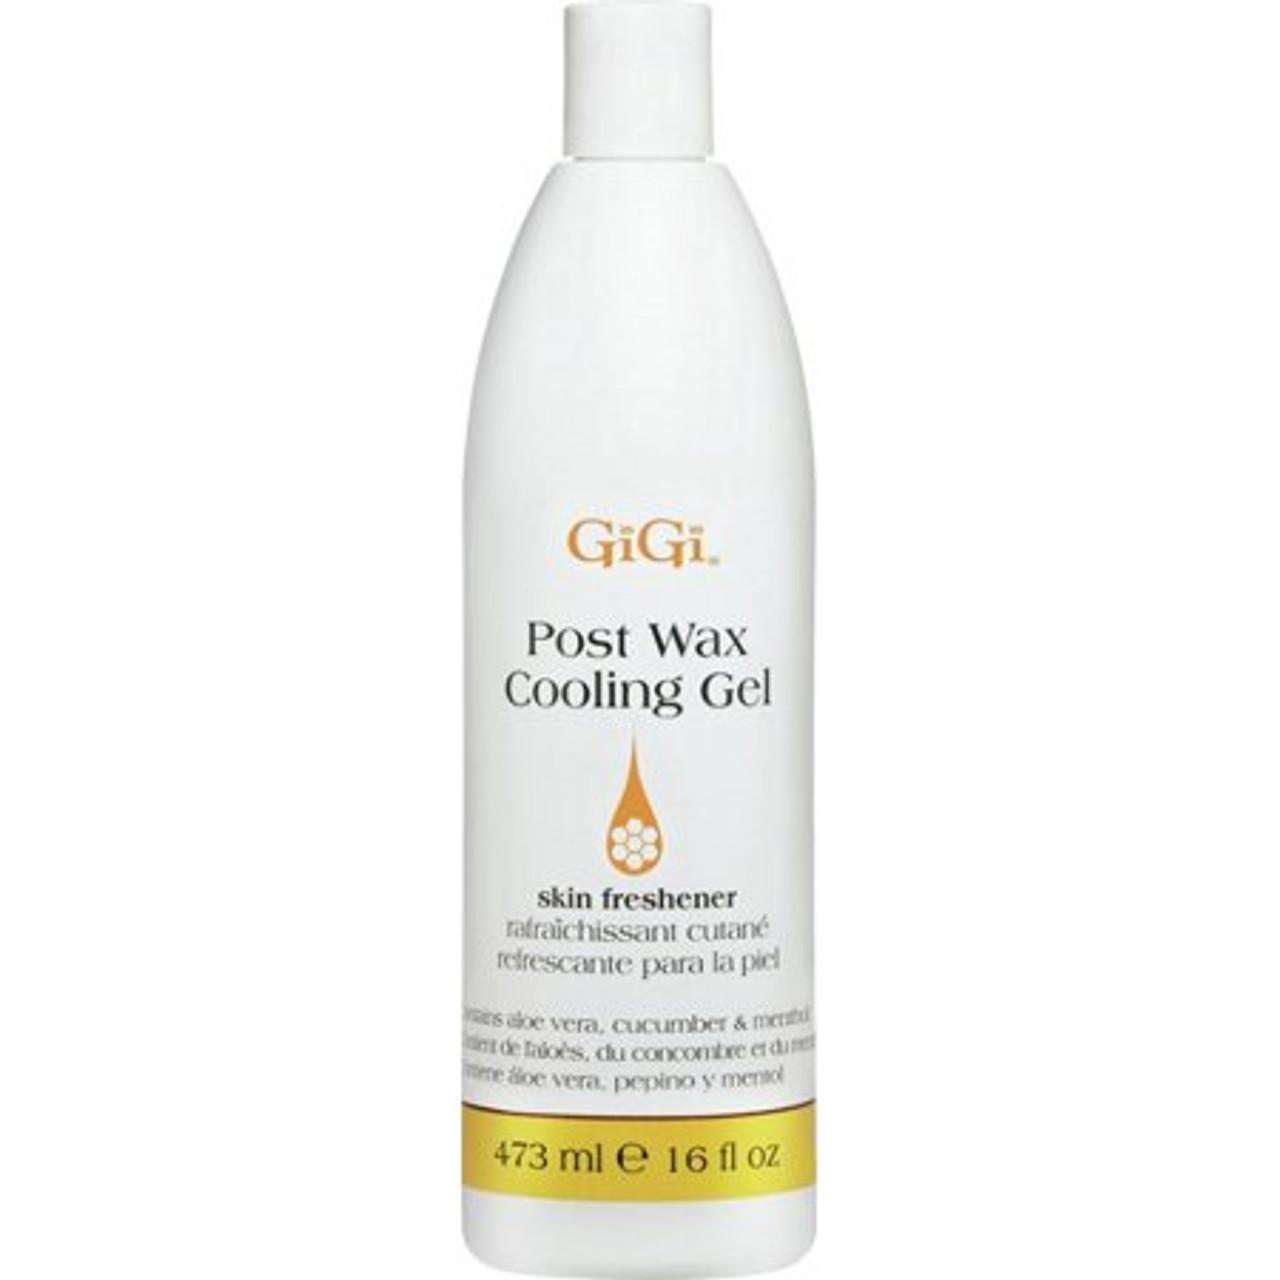 GiGi Post Wax Cooling Gel 16 oz